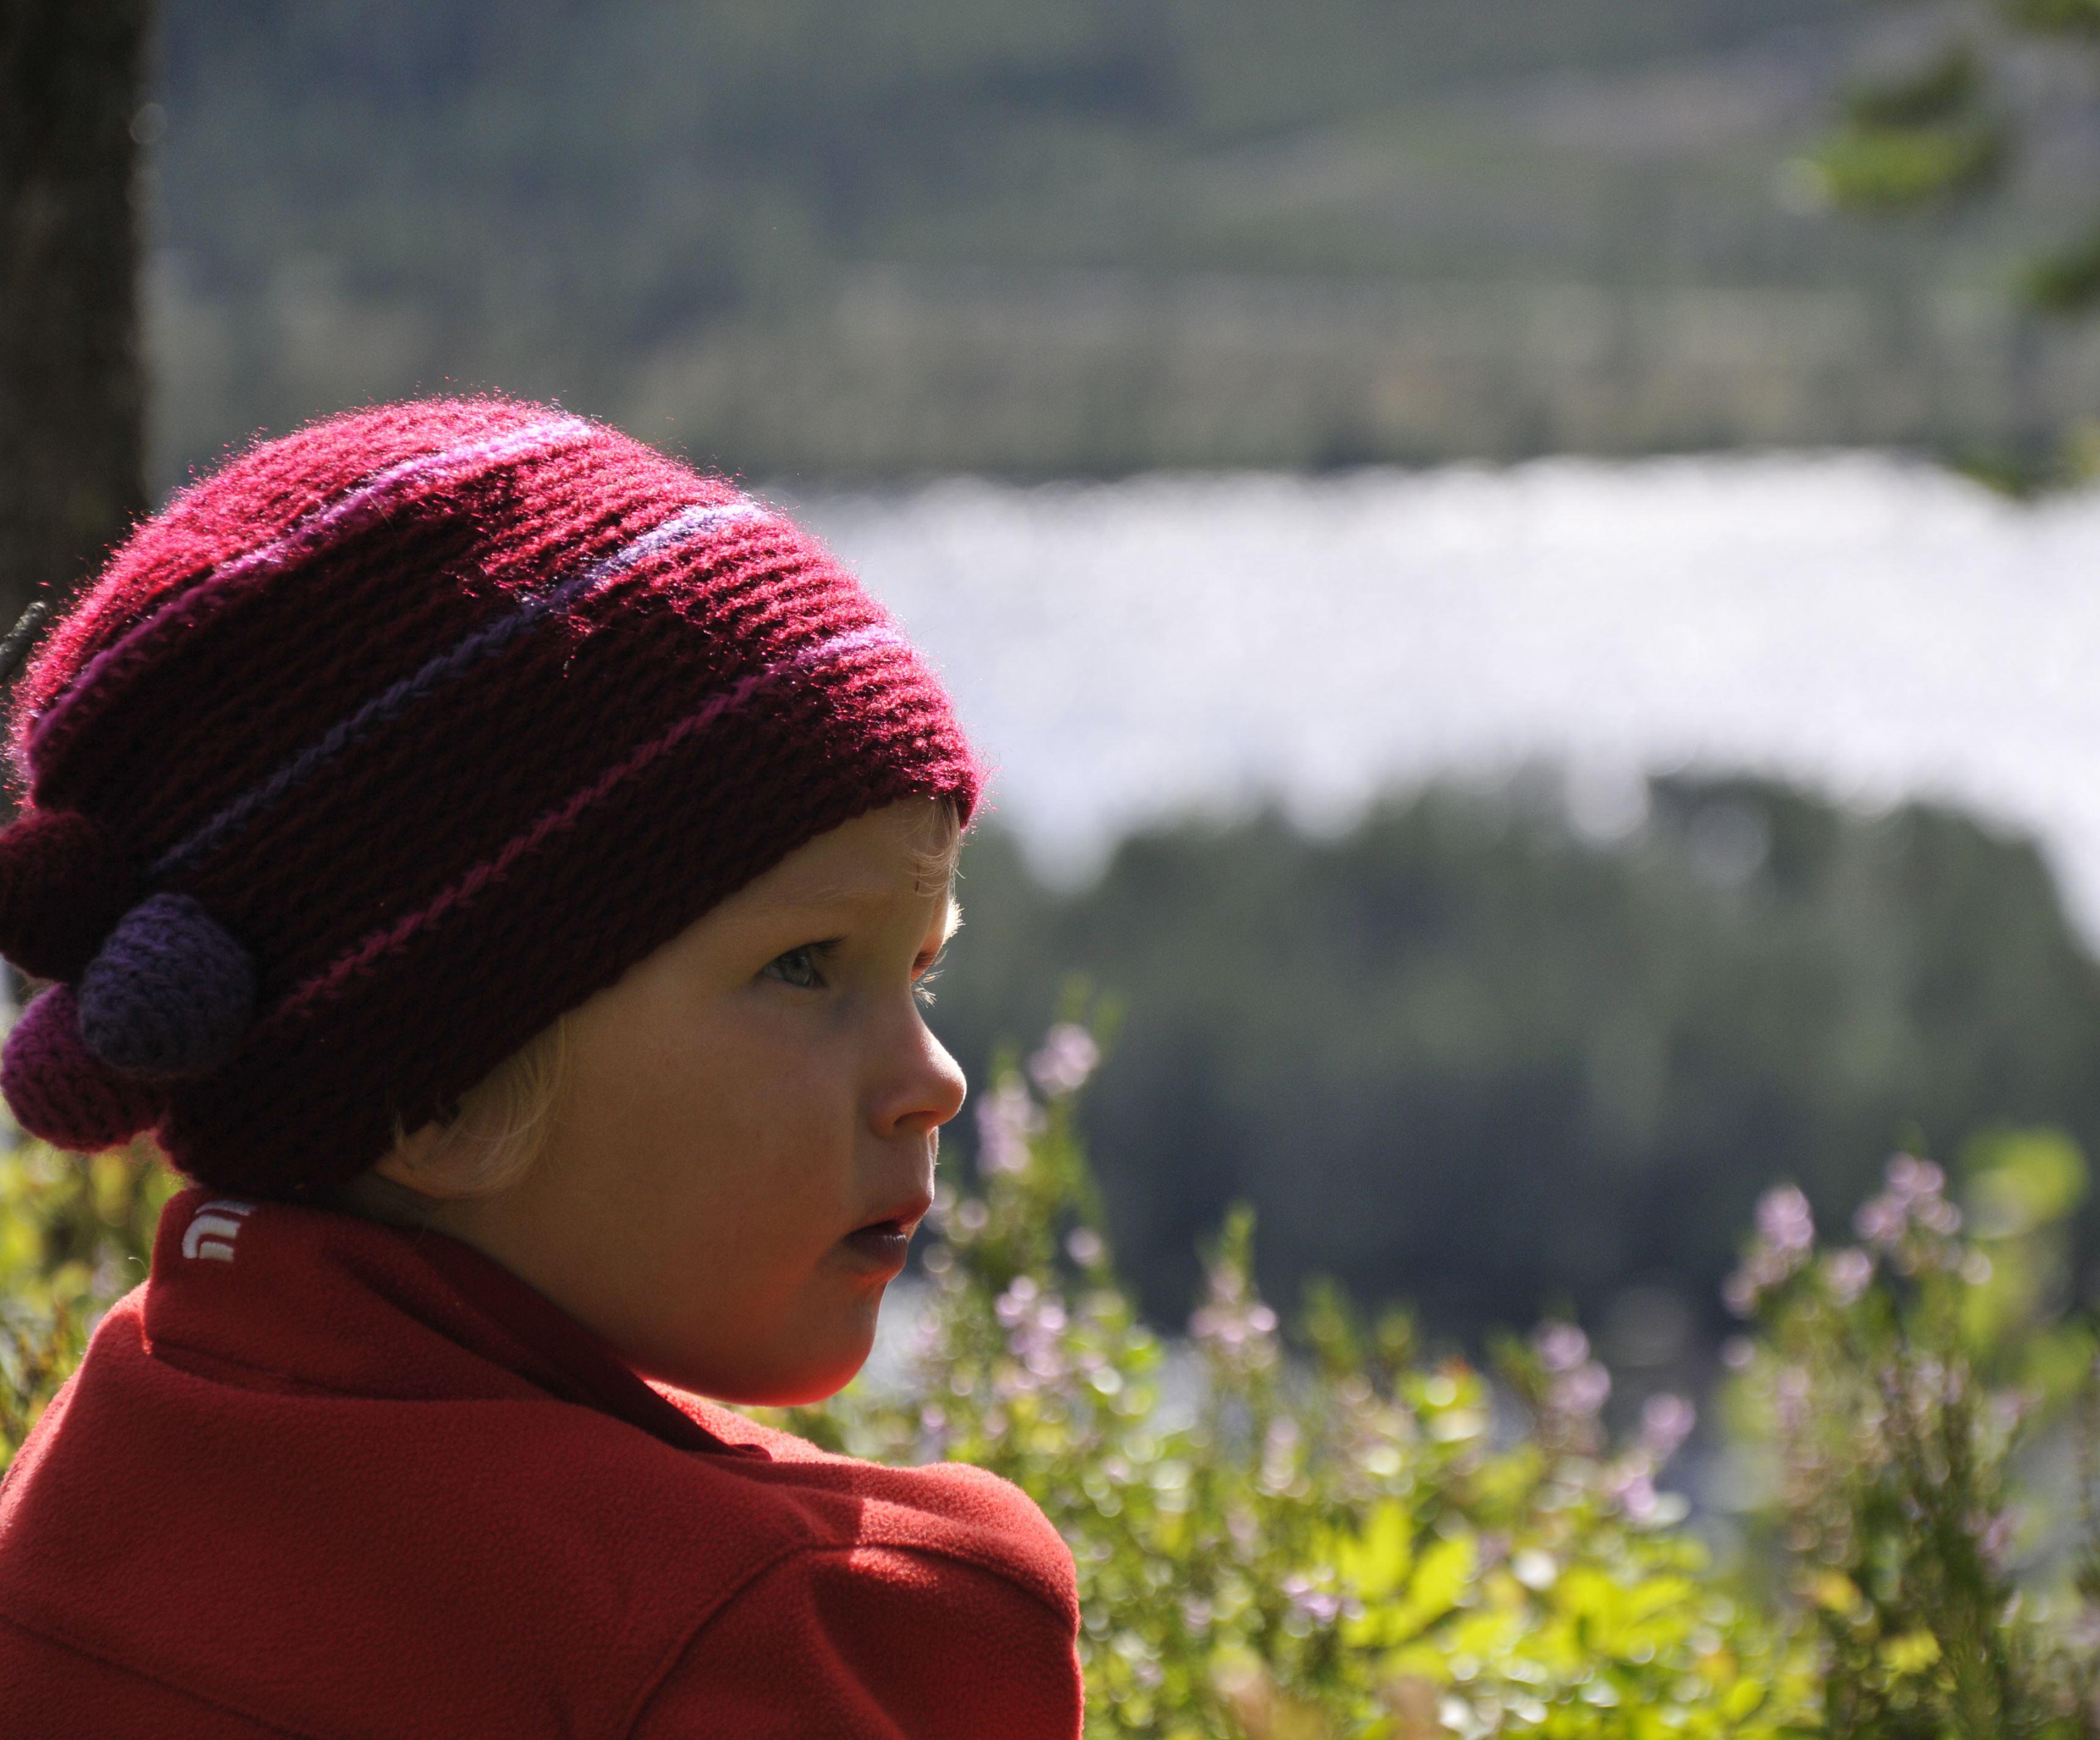 Visit Starrberget nature reserve